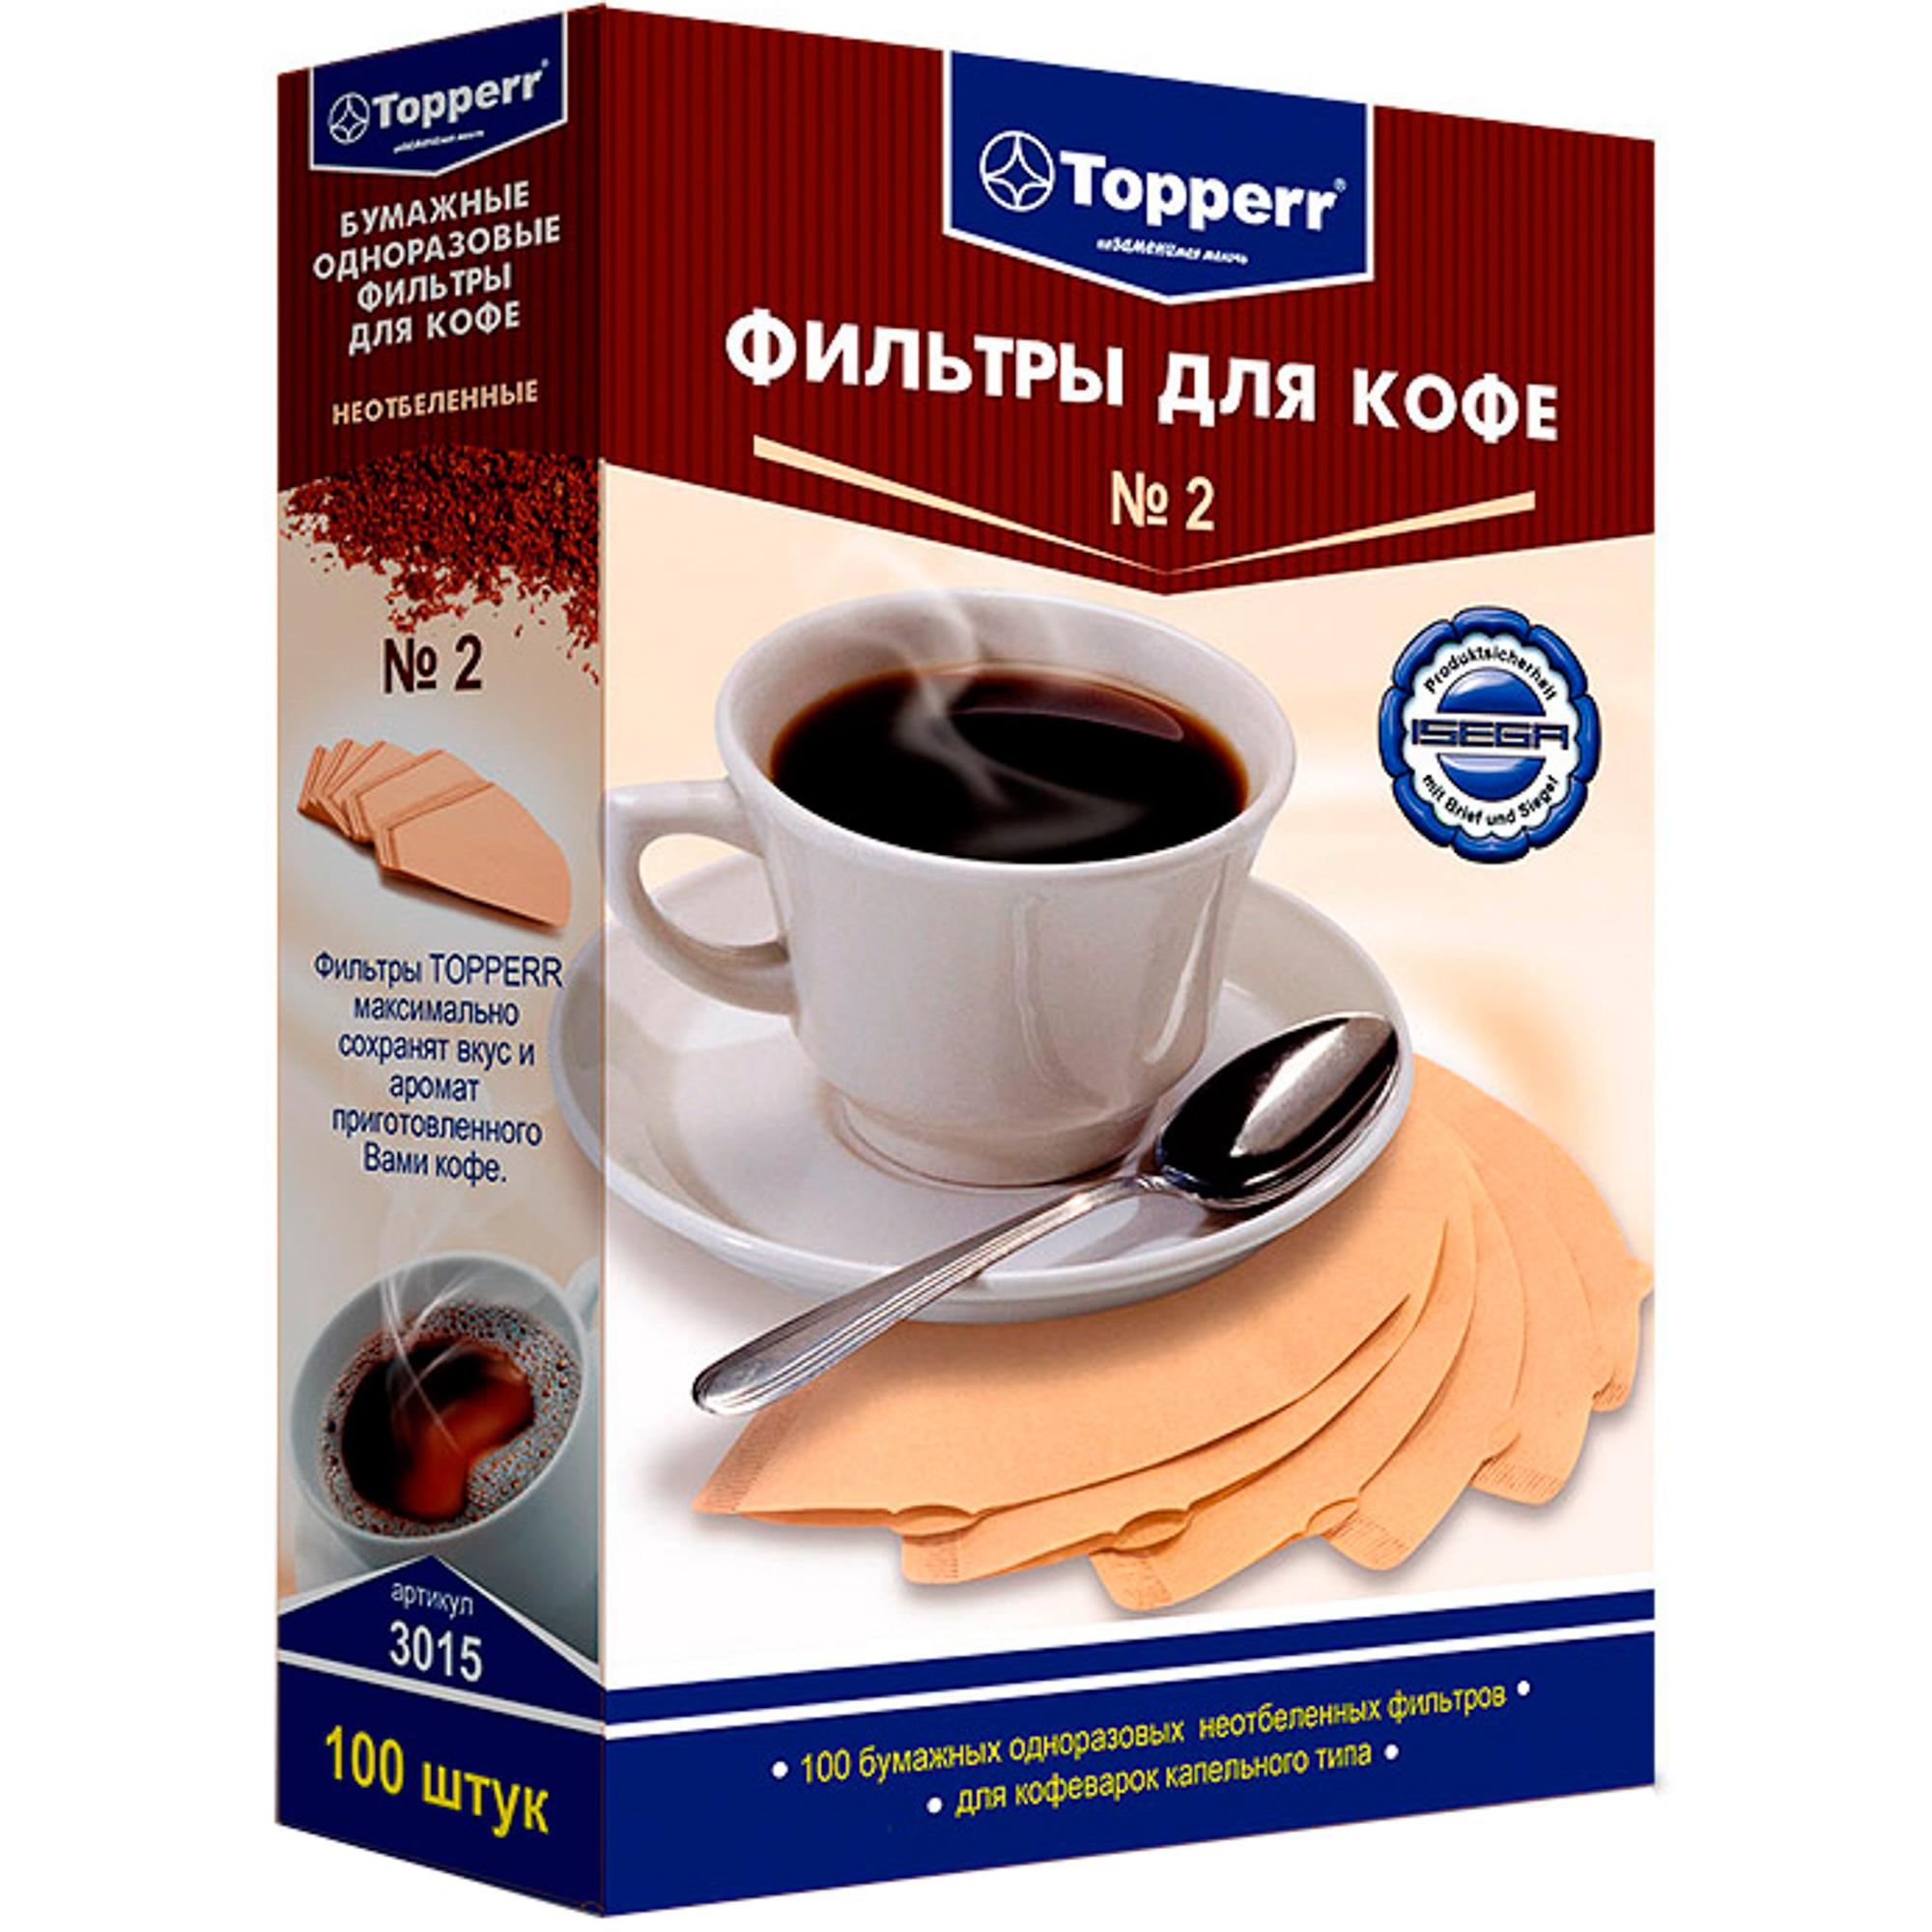 Фильтры бумажные неотбеленные TOPPERR №2